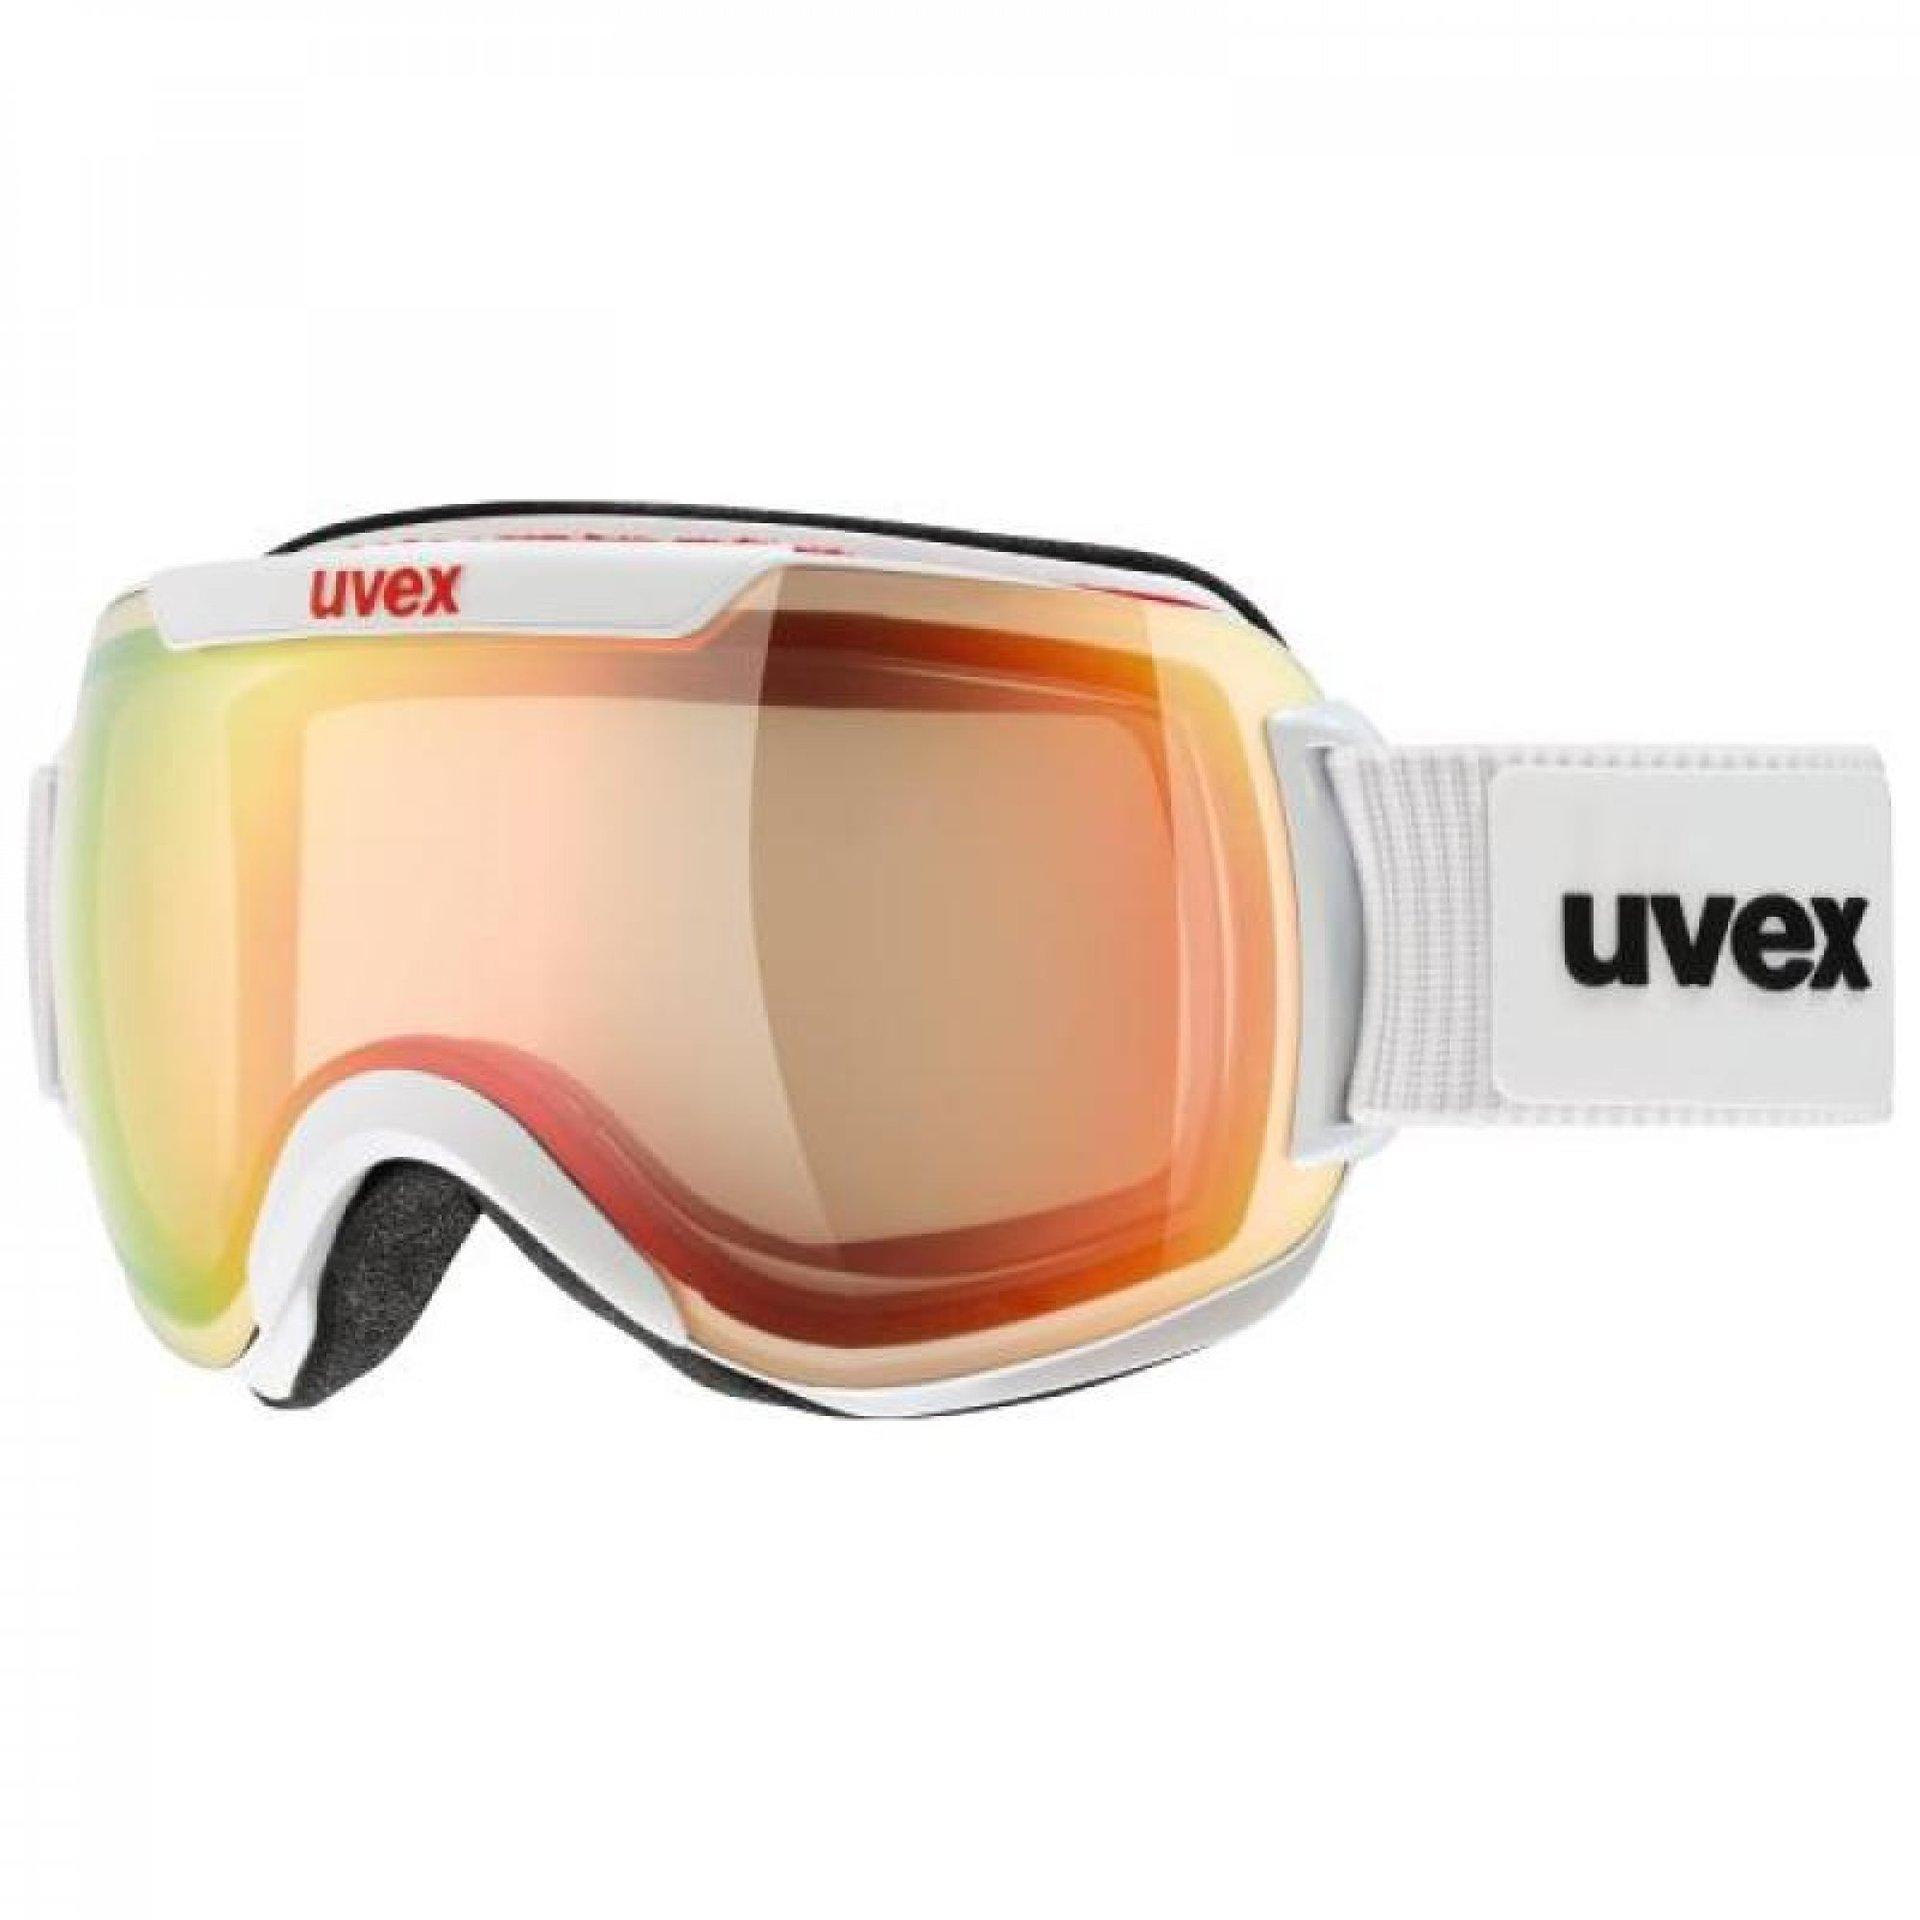 GOGLE UVEX DOWNHILL 2000 VFM  WHITE